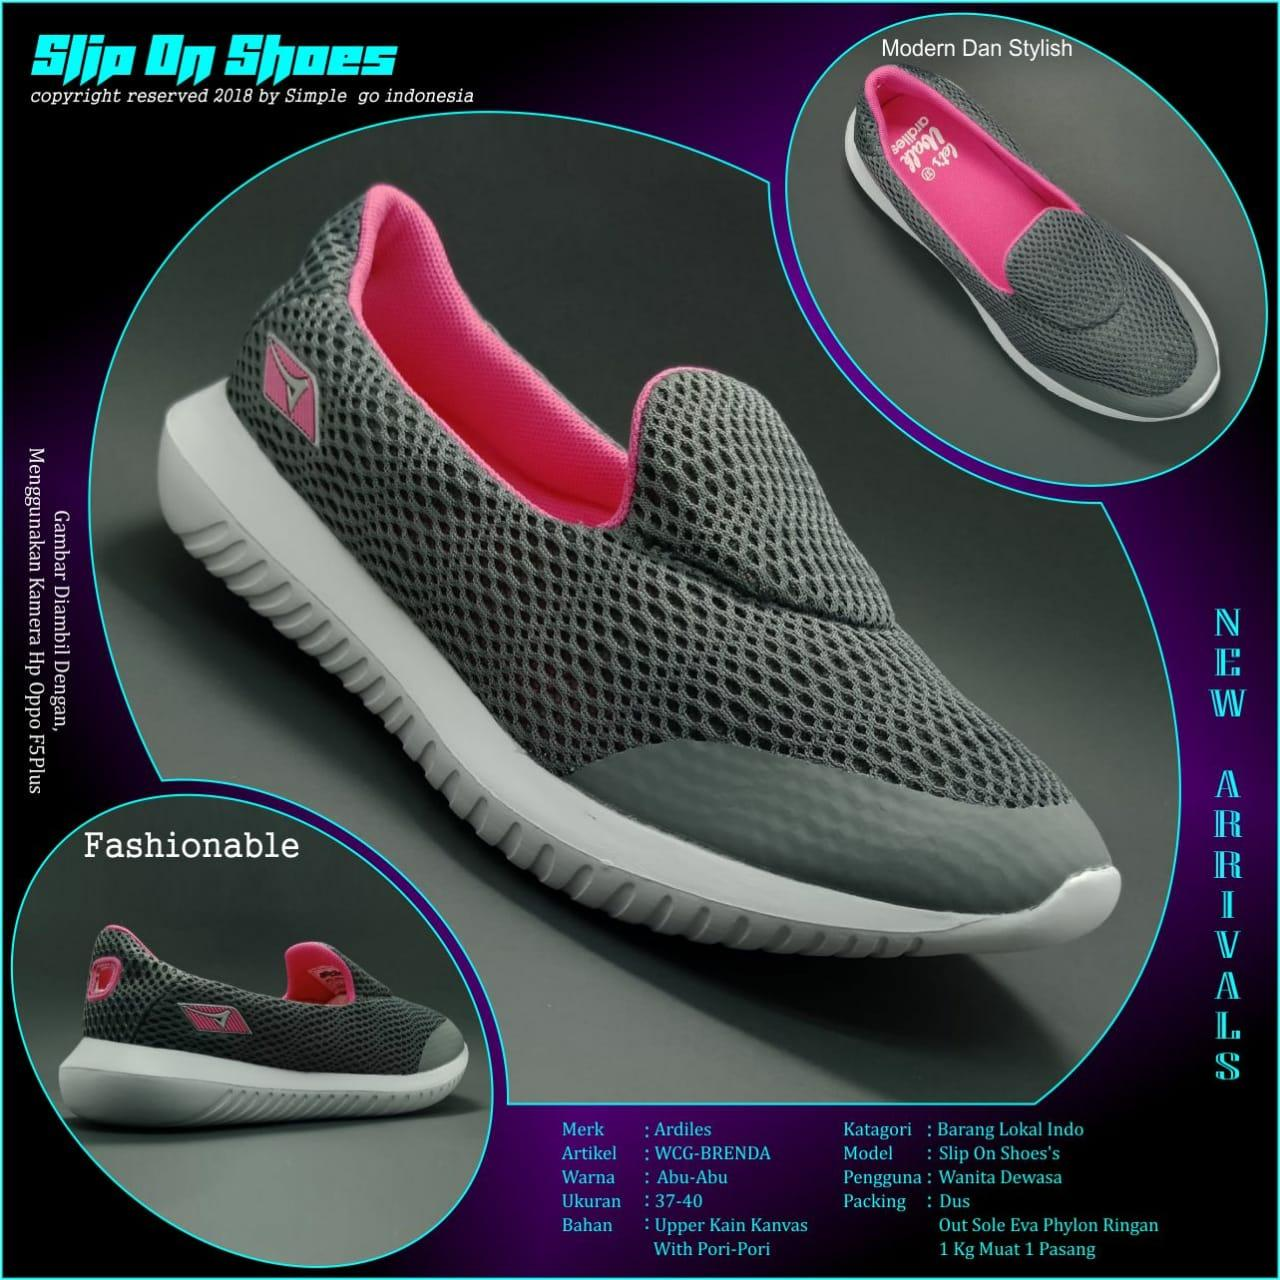 Jual Sepatu Sandal Ardiles Terbaik Men Edogawa Running Hitam 44 Brenda Wanita Casual 37 40